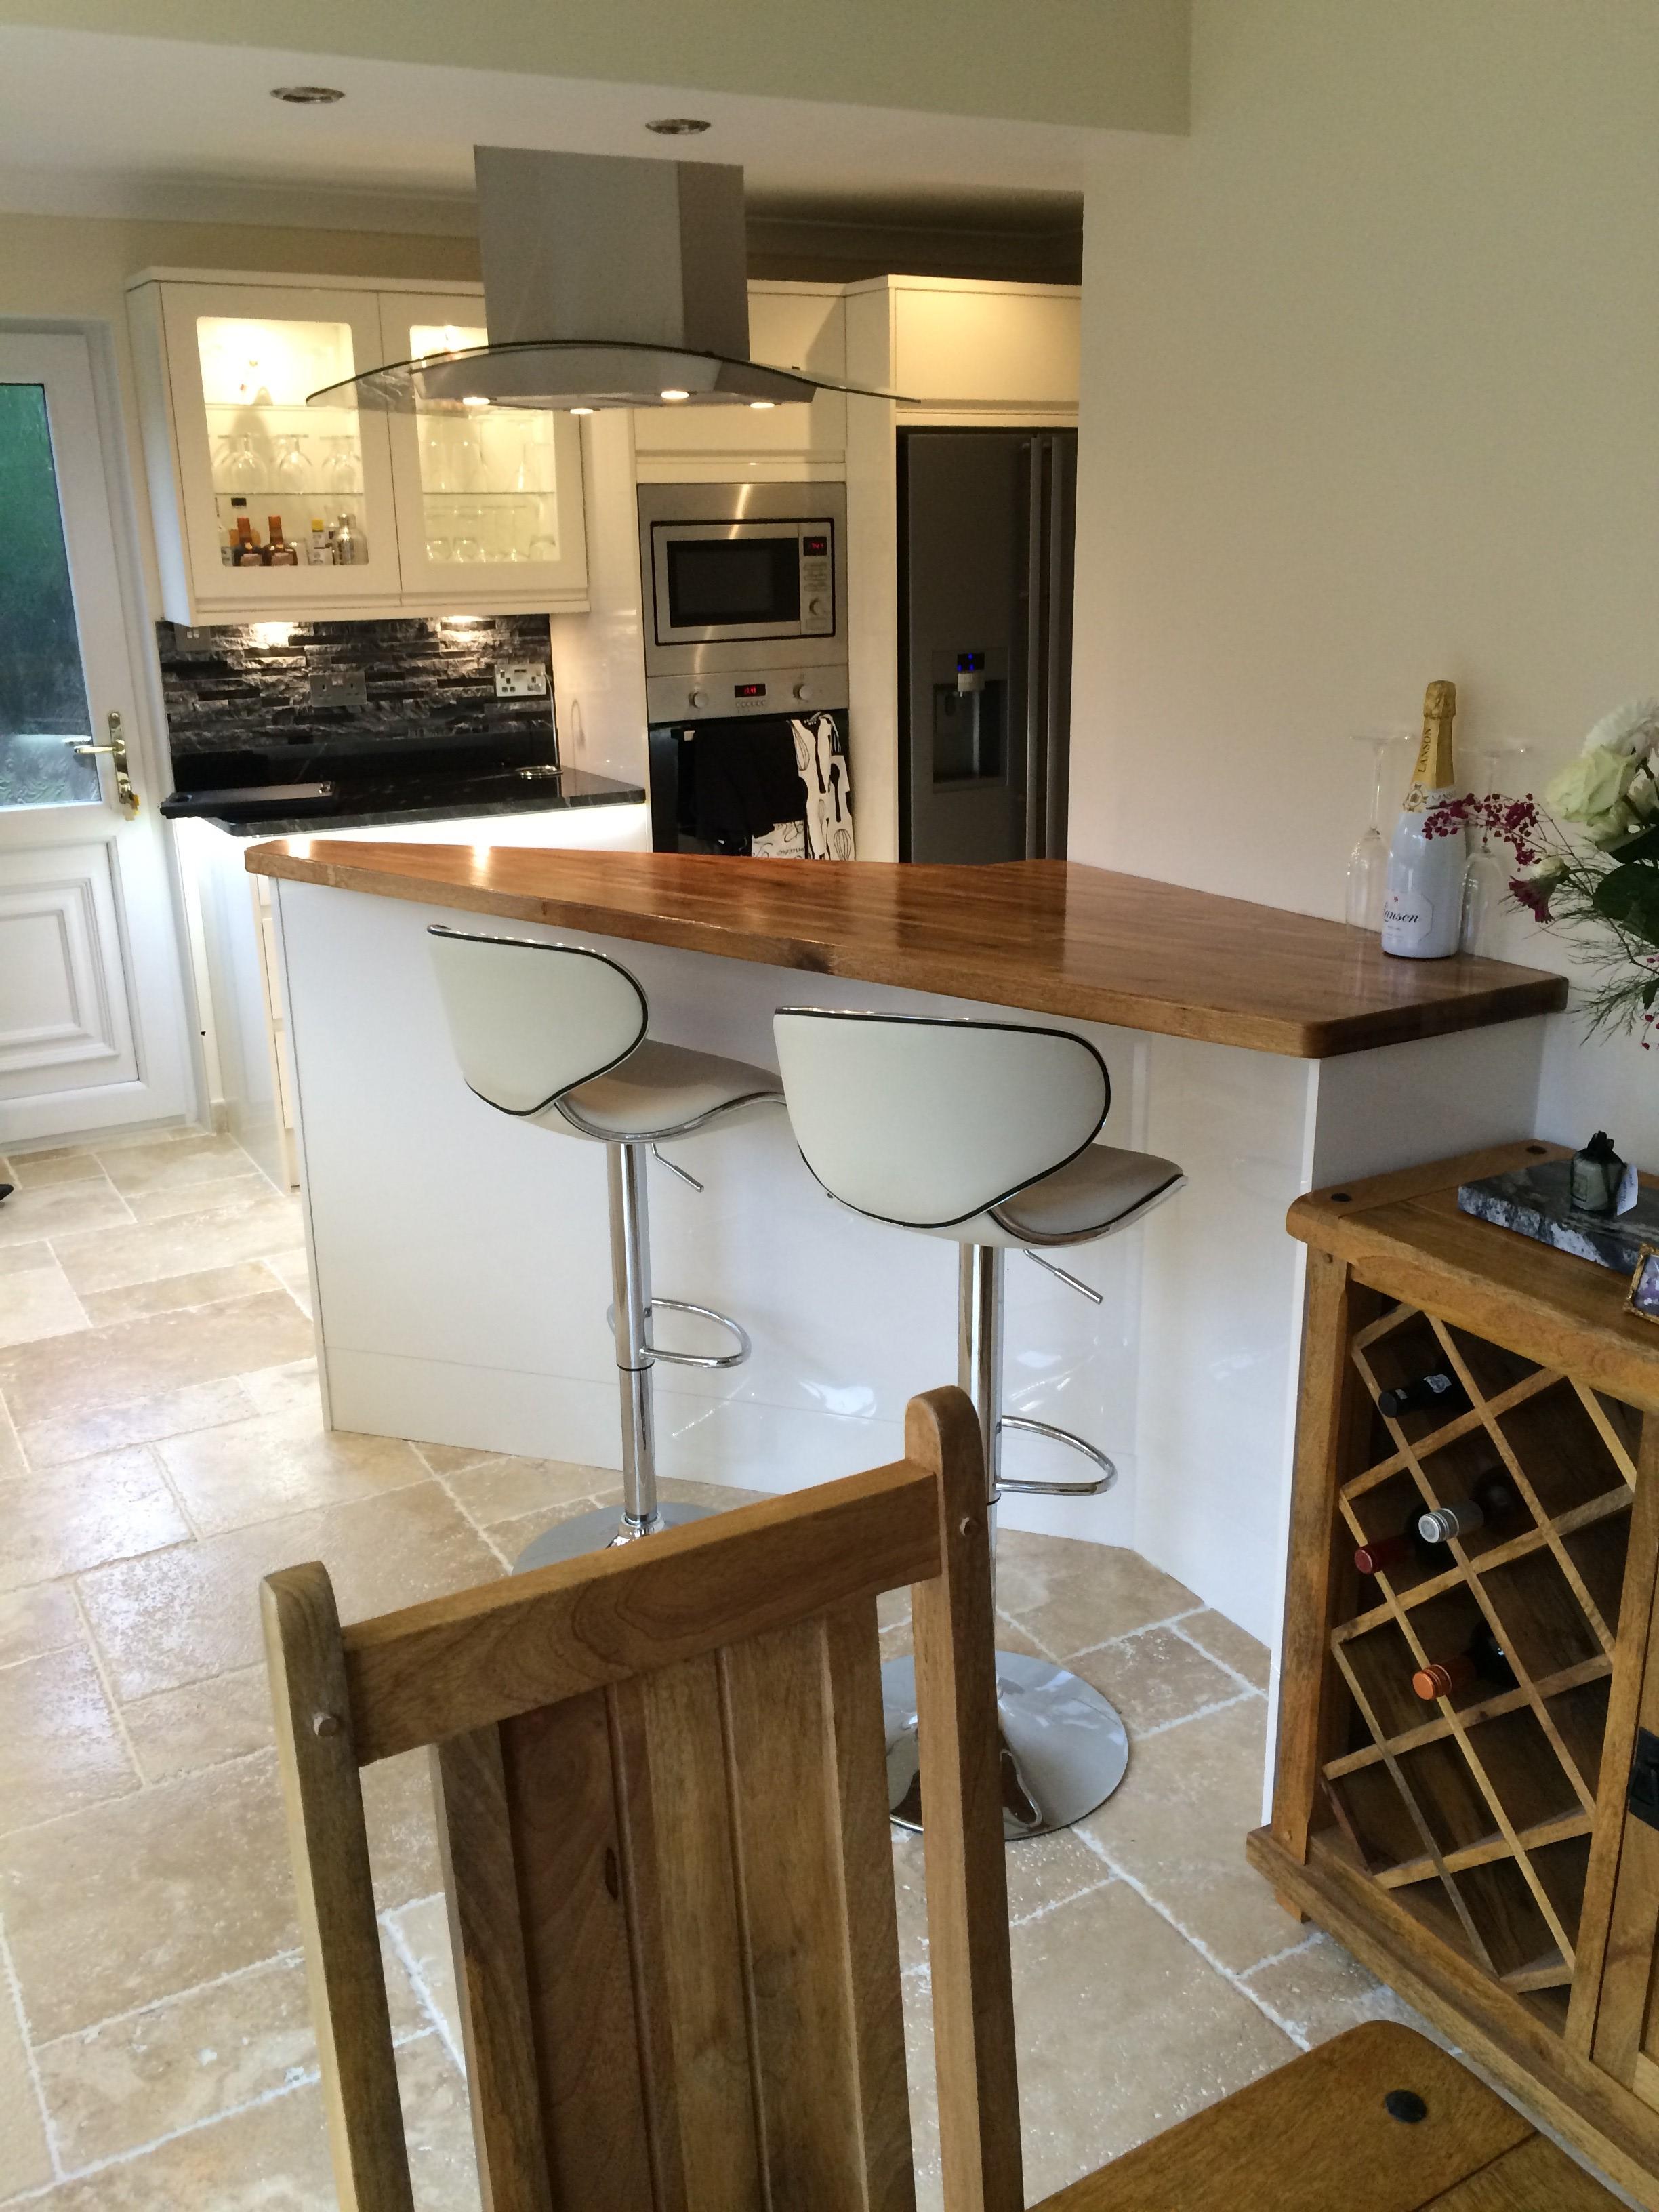 Kitchen Unit Led Lights Kitchen New Forrest Black Granite On High Gloss White Units With